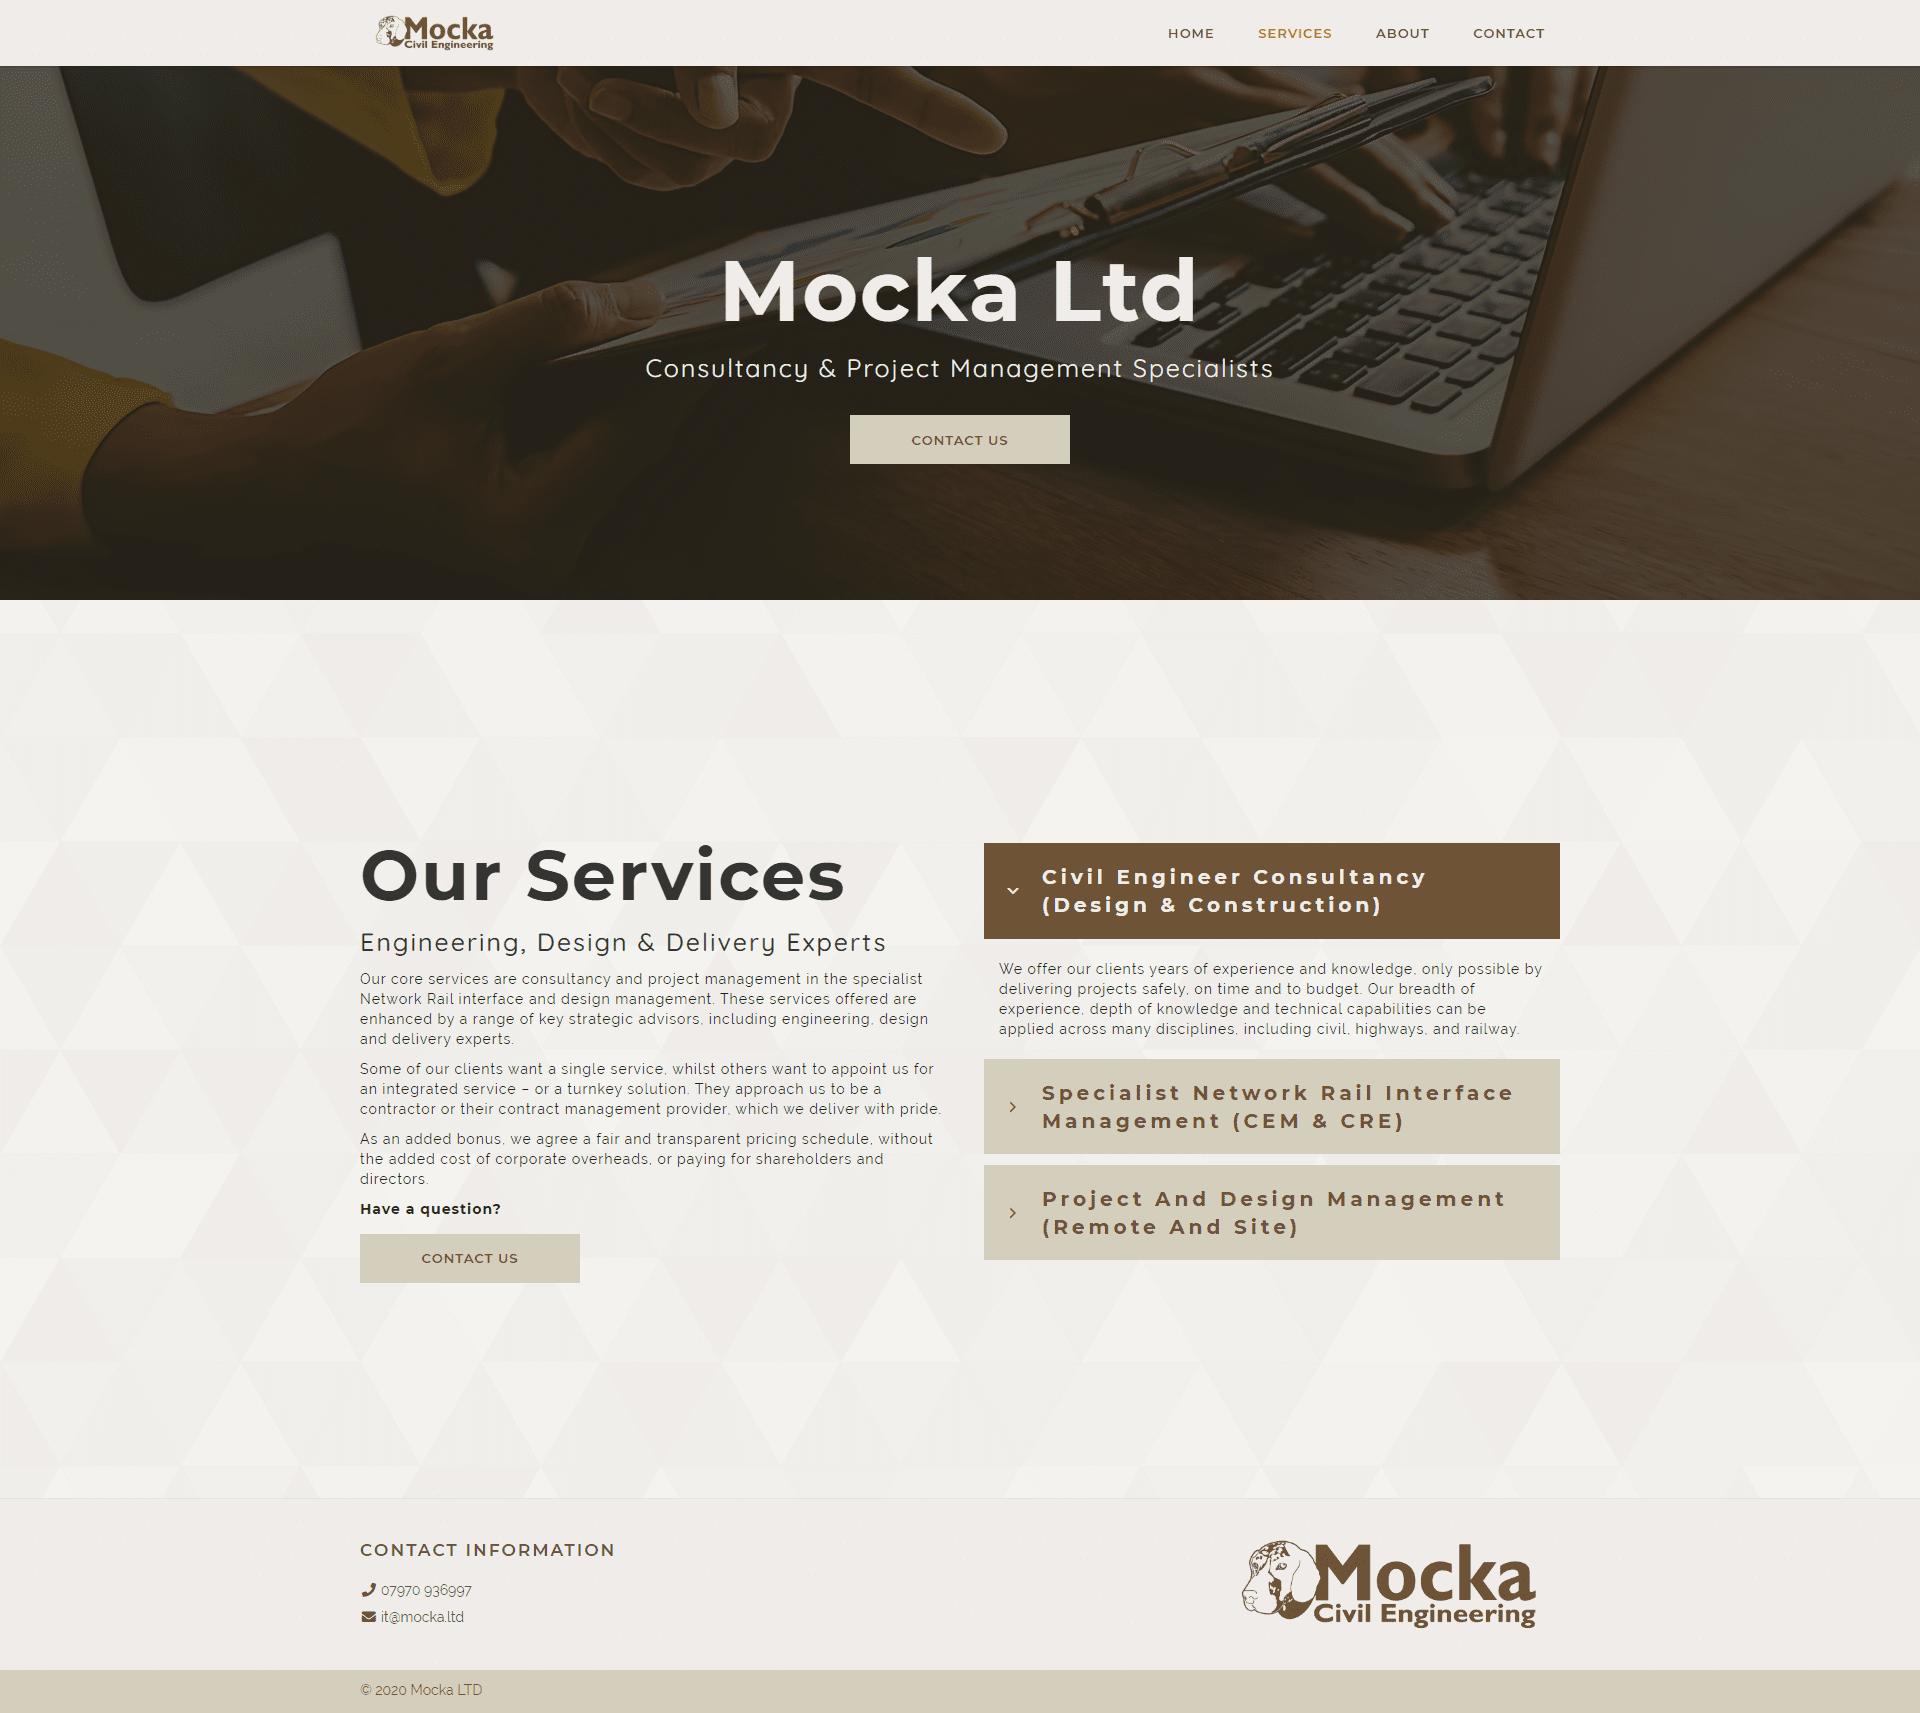 screencapture-mocka-ltd-services-